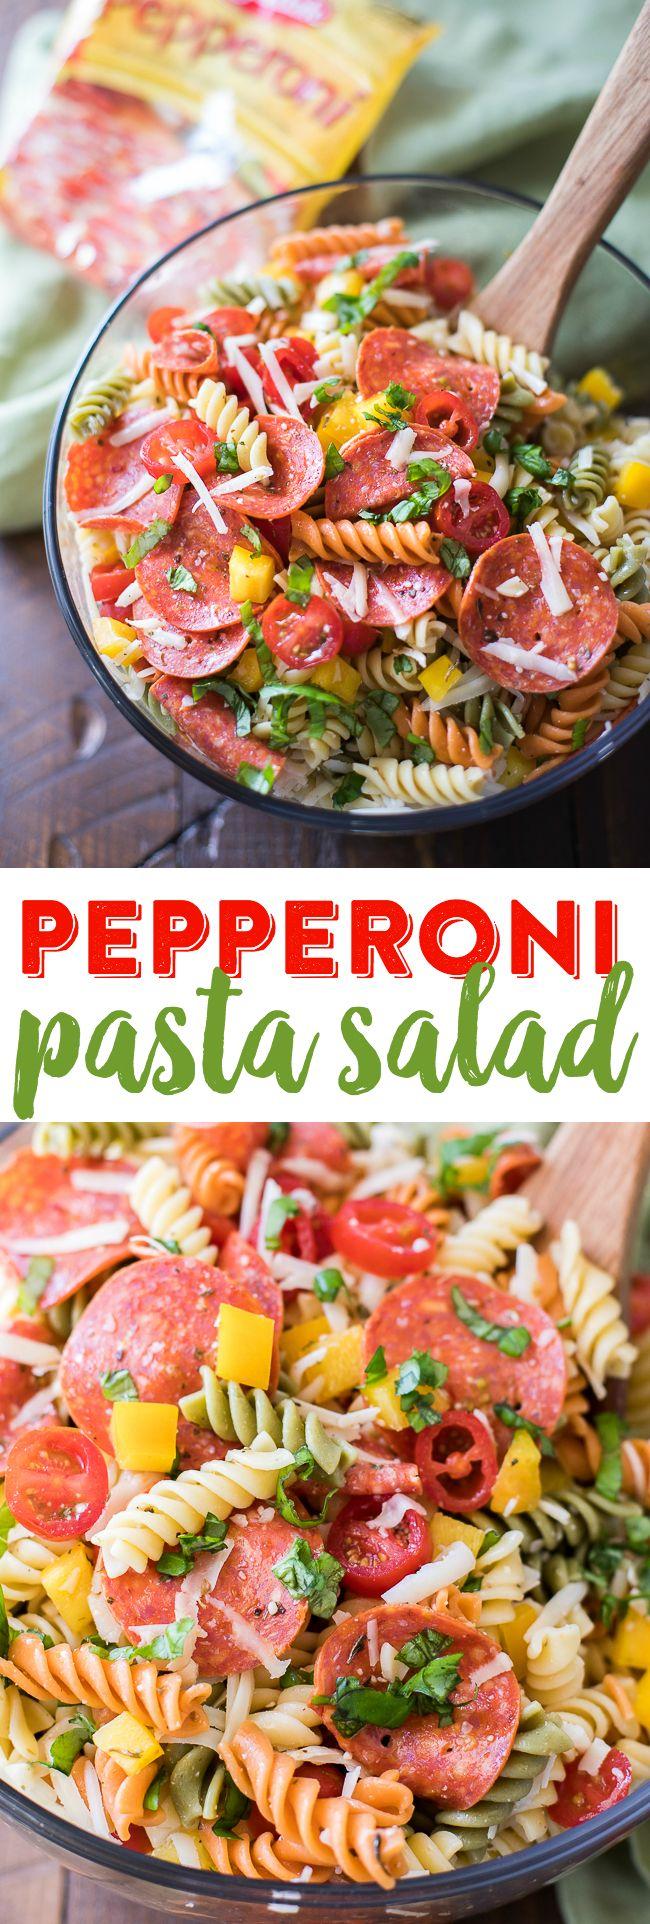 Pepperoni Pasta Salad Recipe | Tri-Color Pasta Salad Recipe | Italian Pasta Salad | Rainbow Pasta Salad #AD